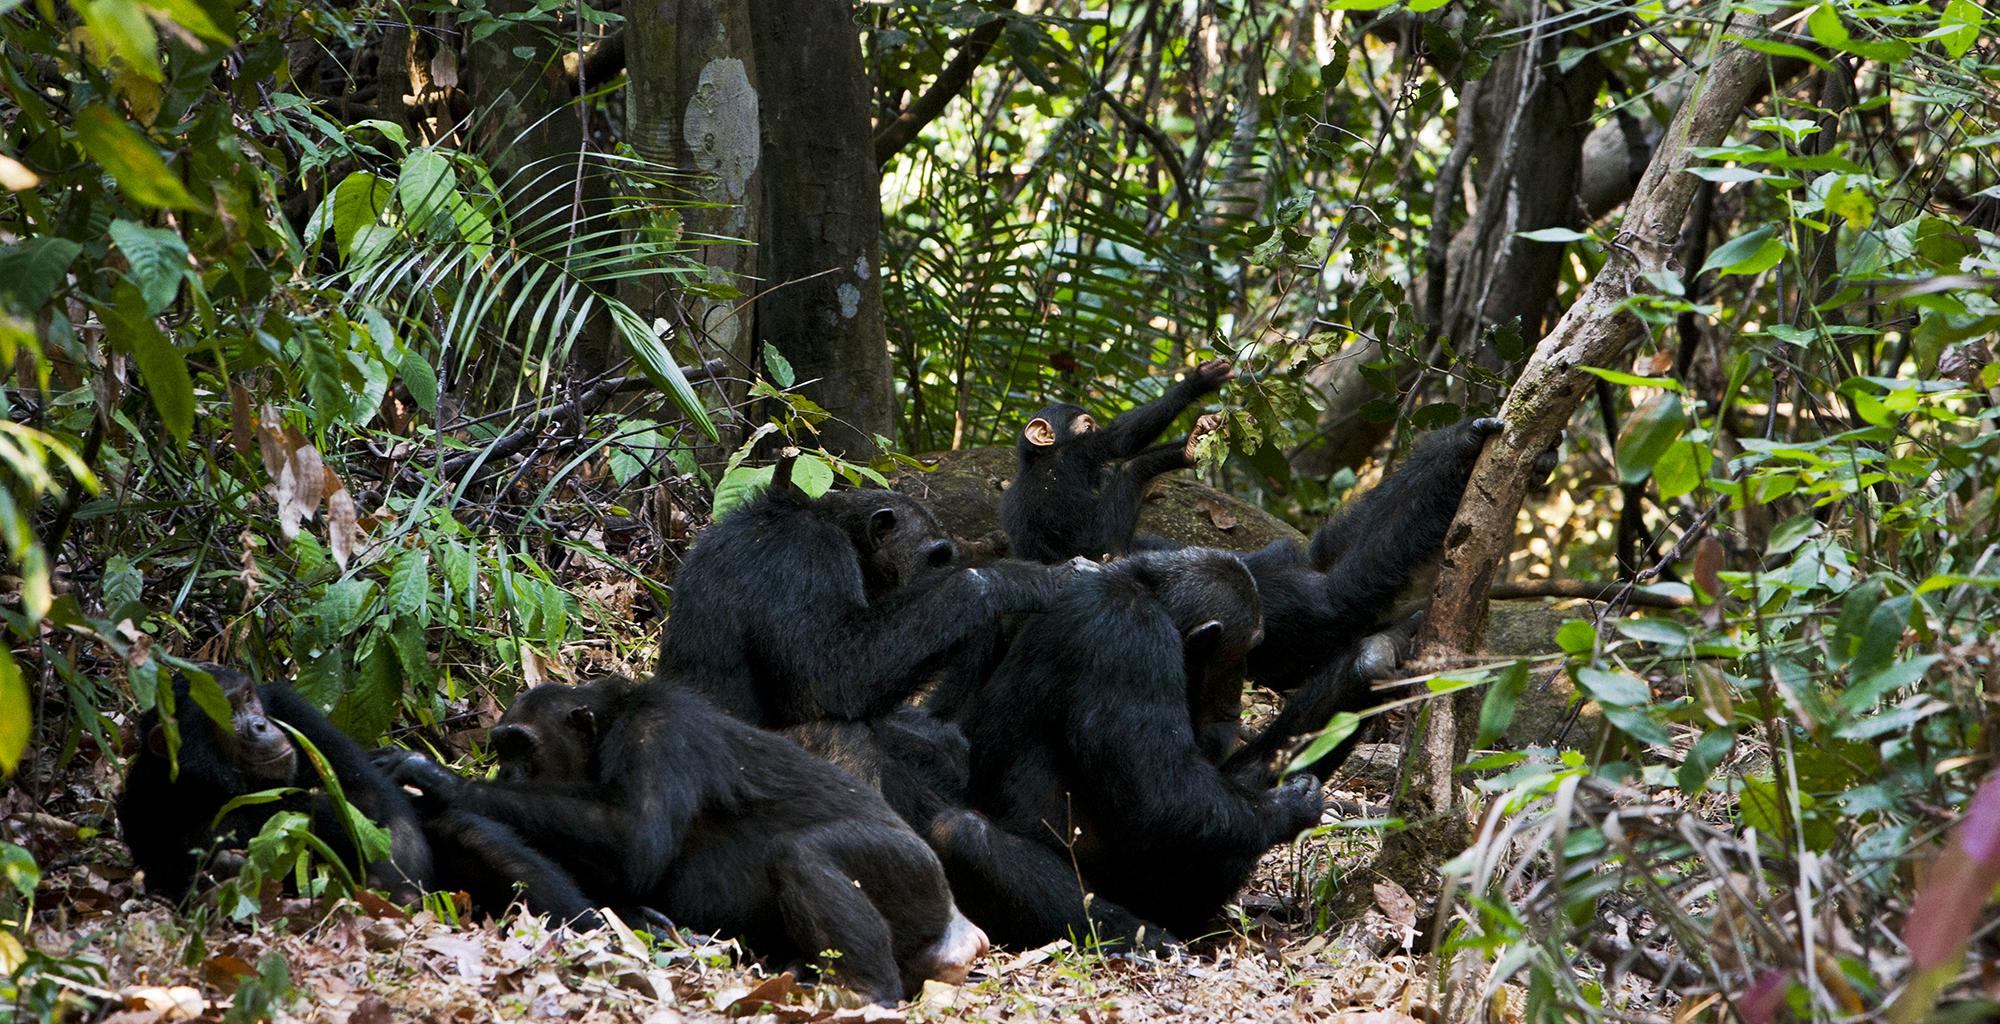 Tanzania-Chimp-Nest-Grooming